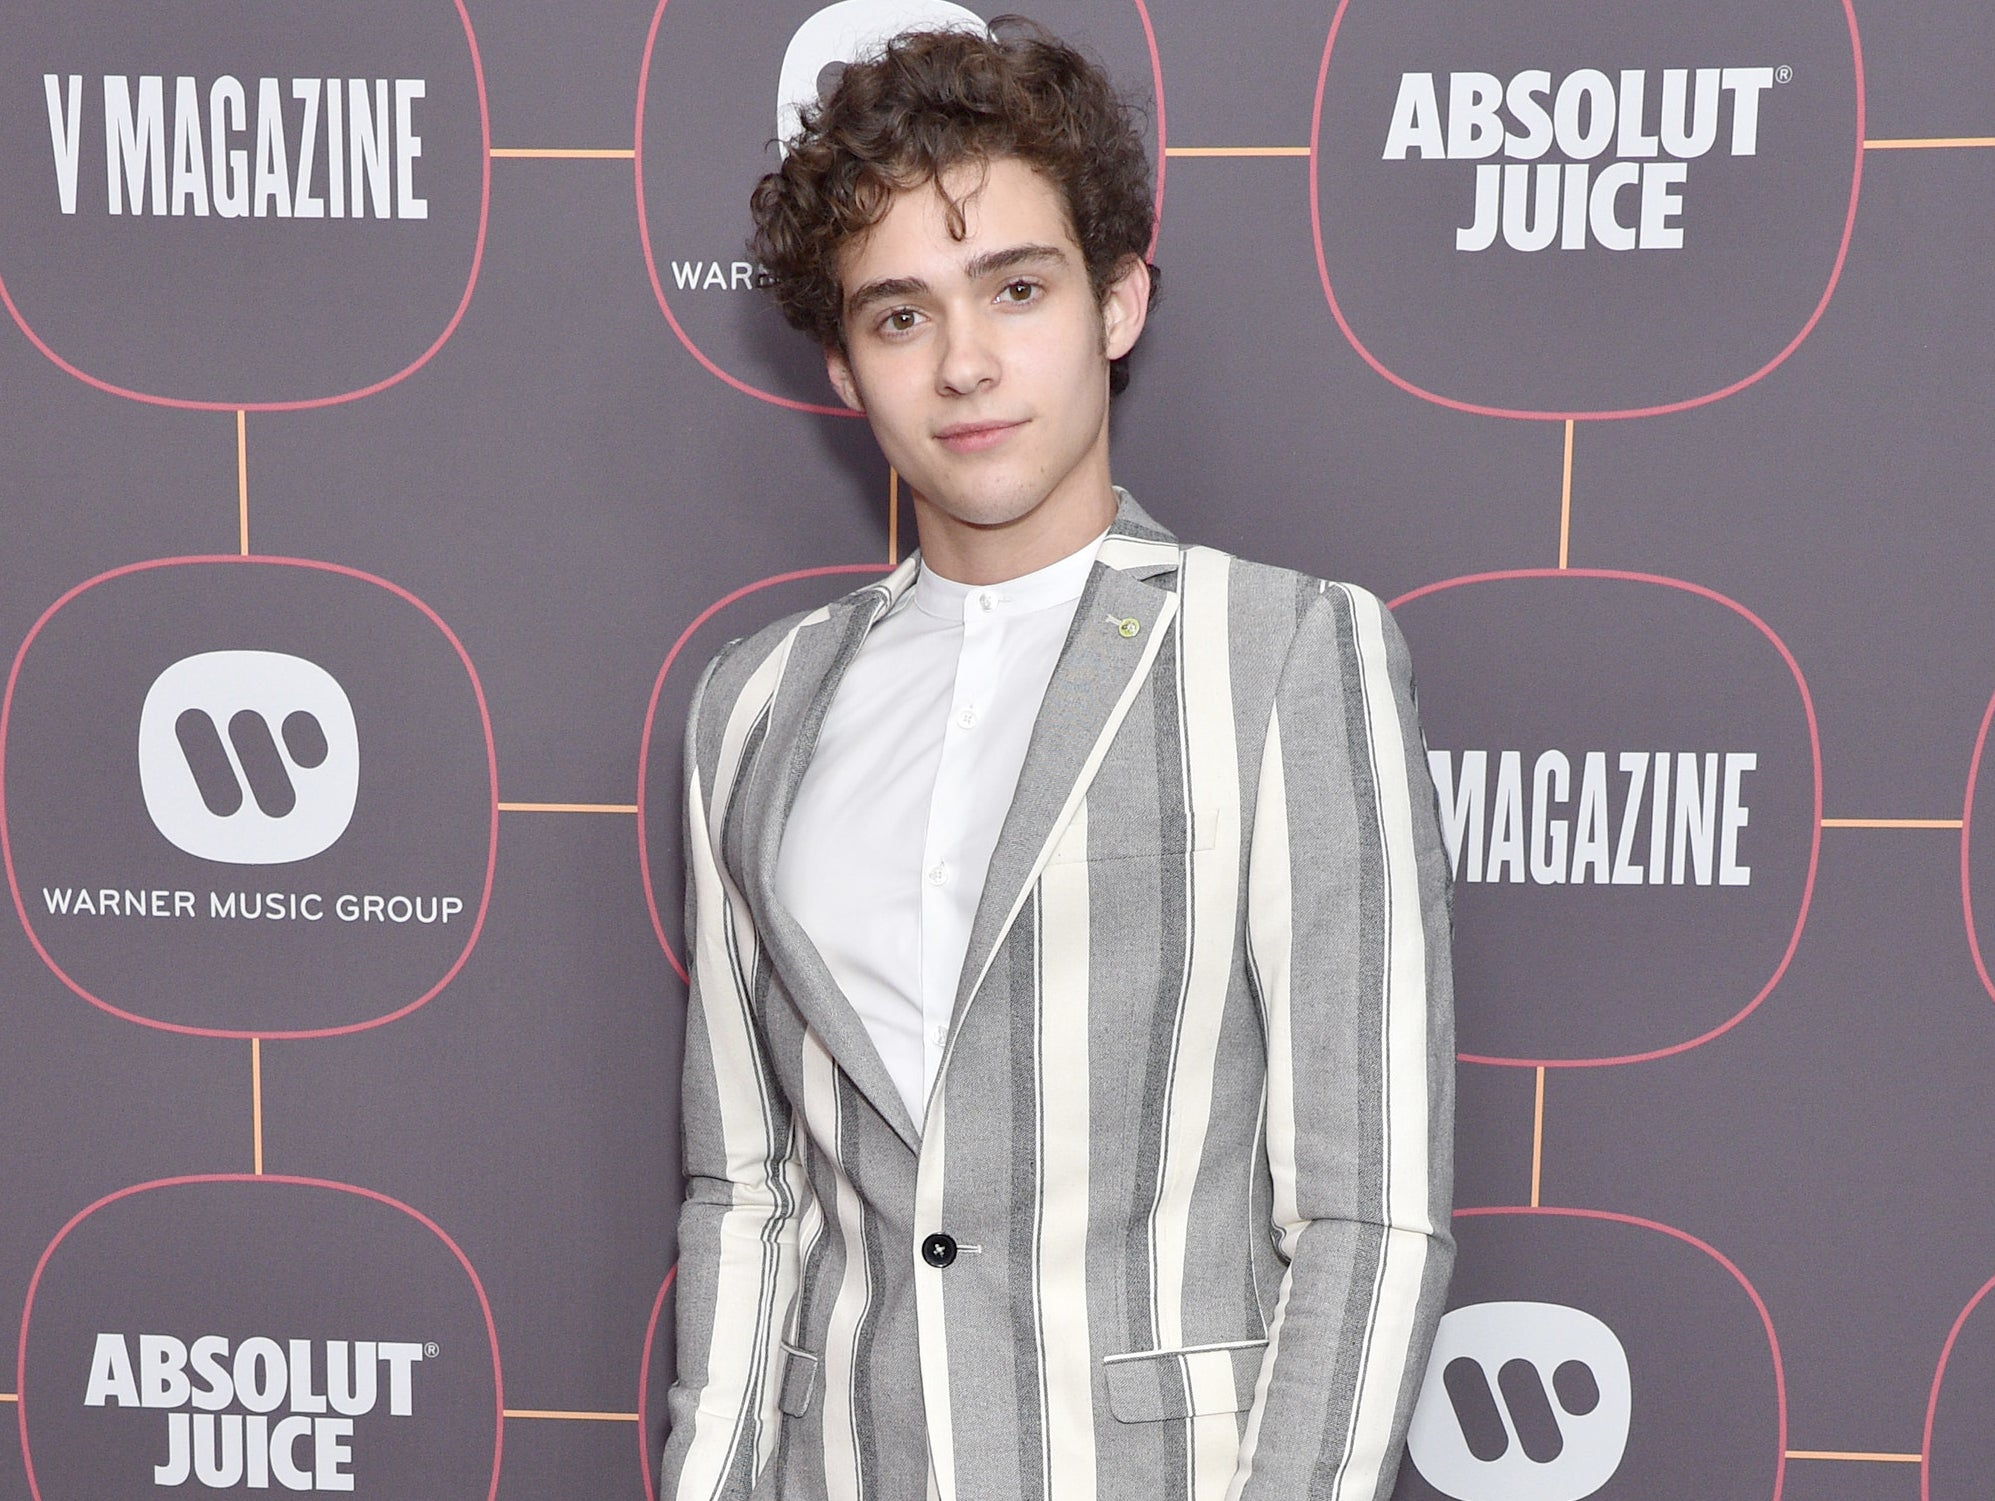 Joshua wears a striped blazer at an event